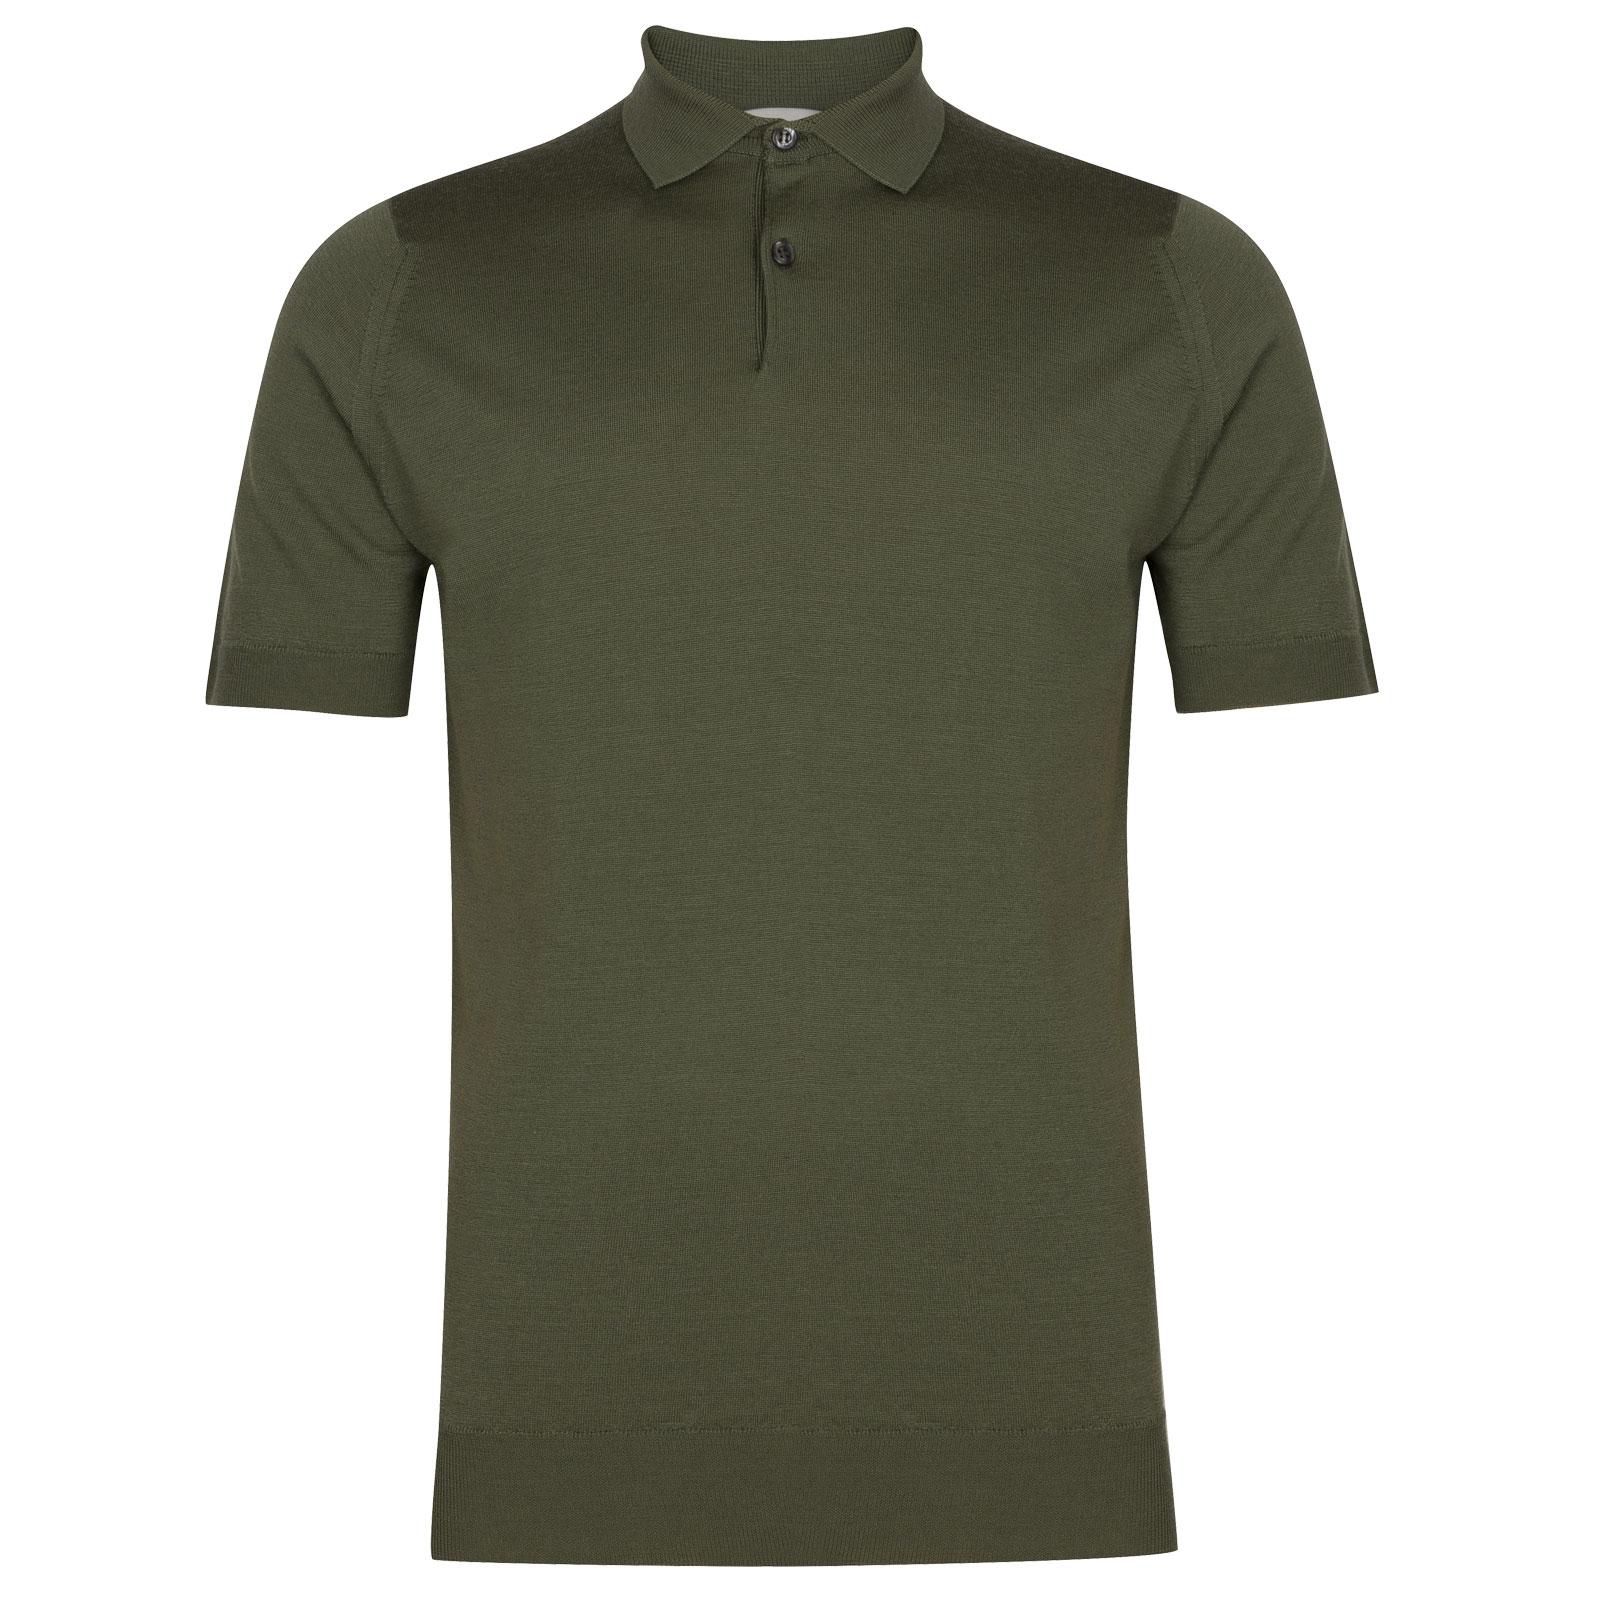 John Smedley Payton in Sepal Green Shirt-LGE